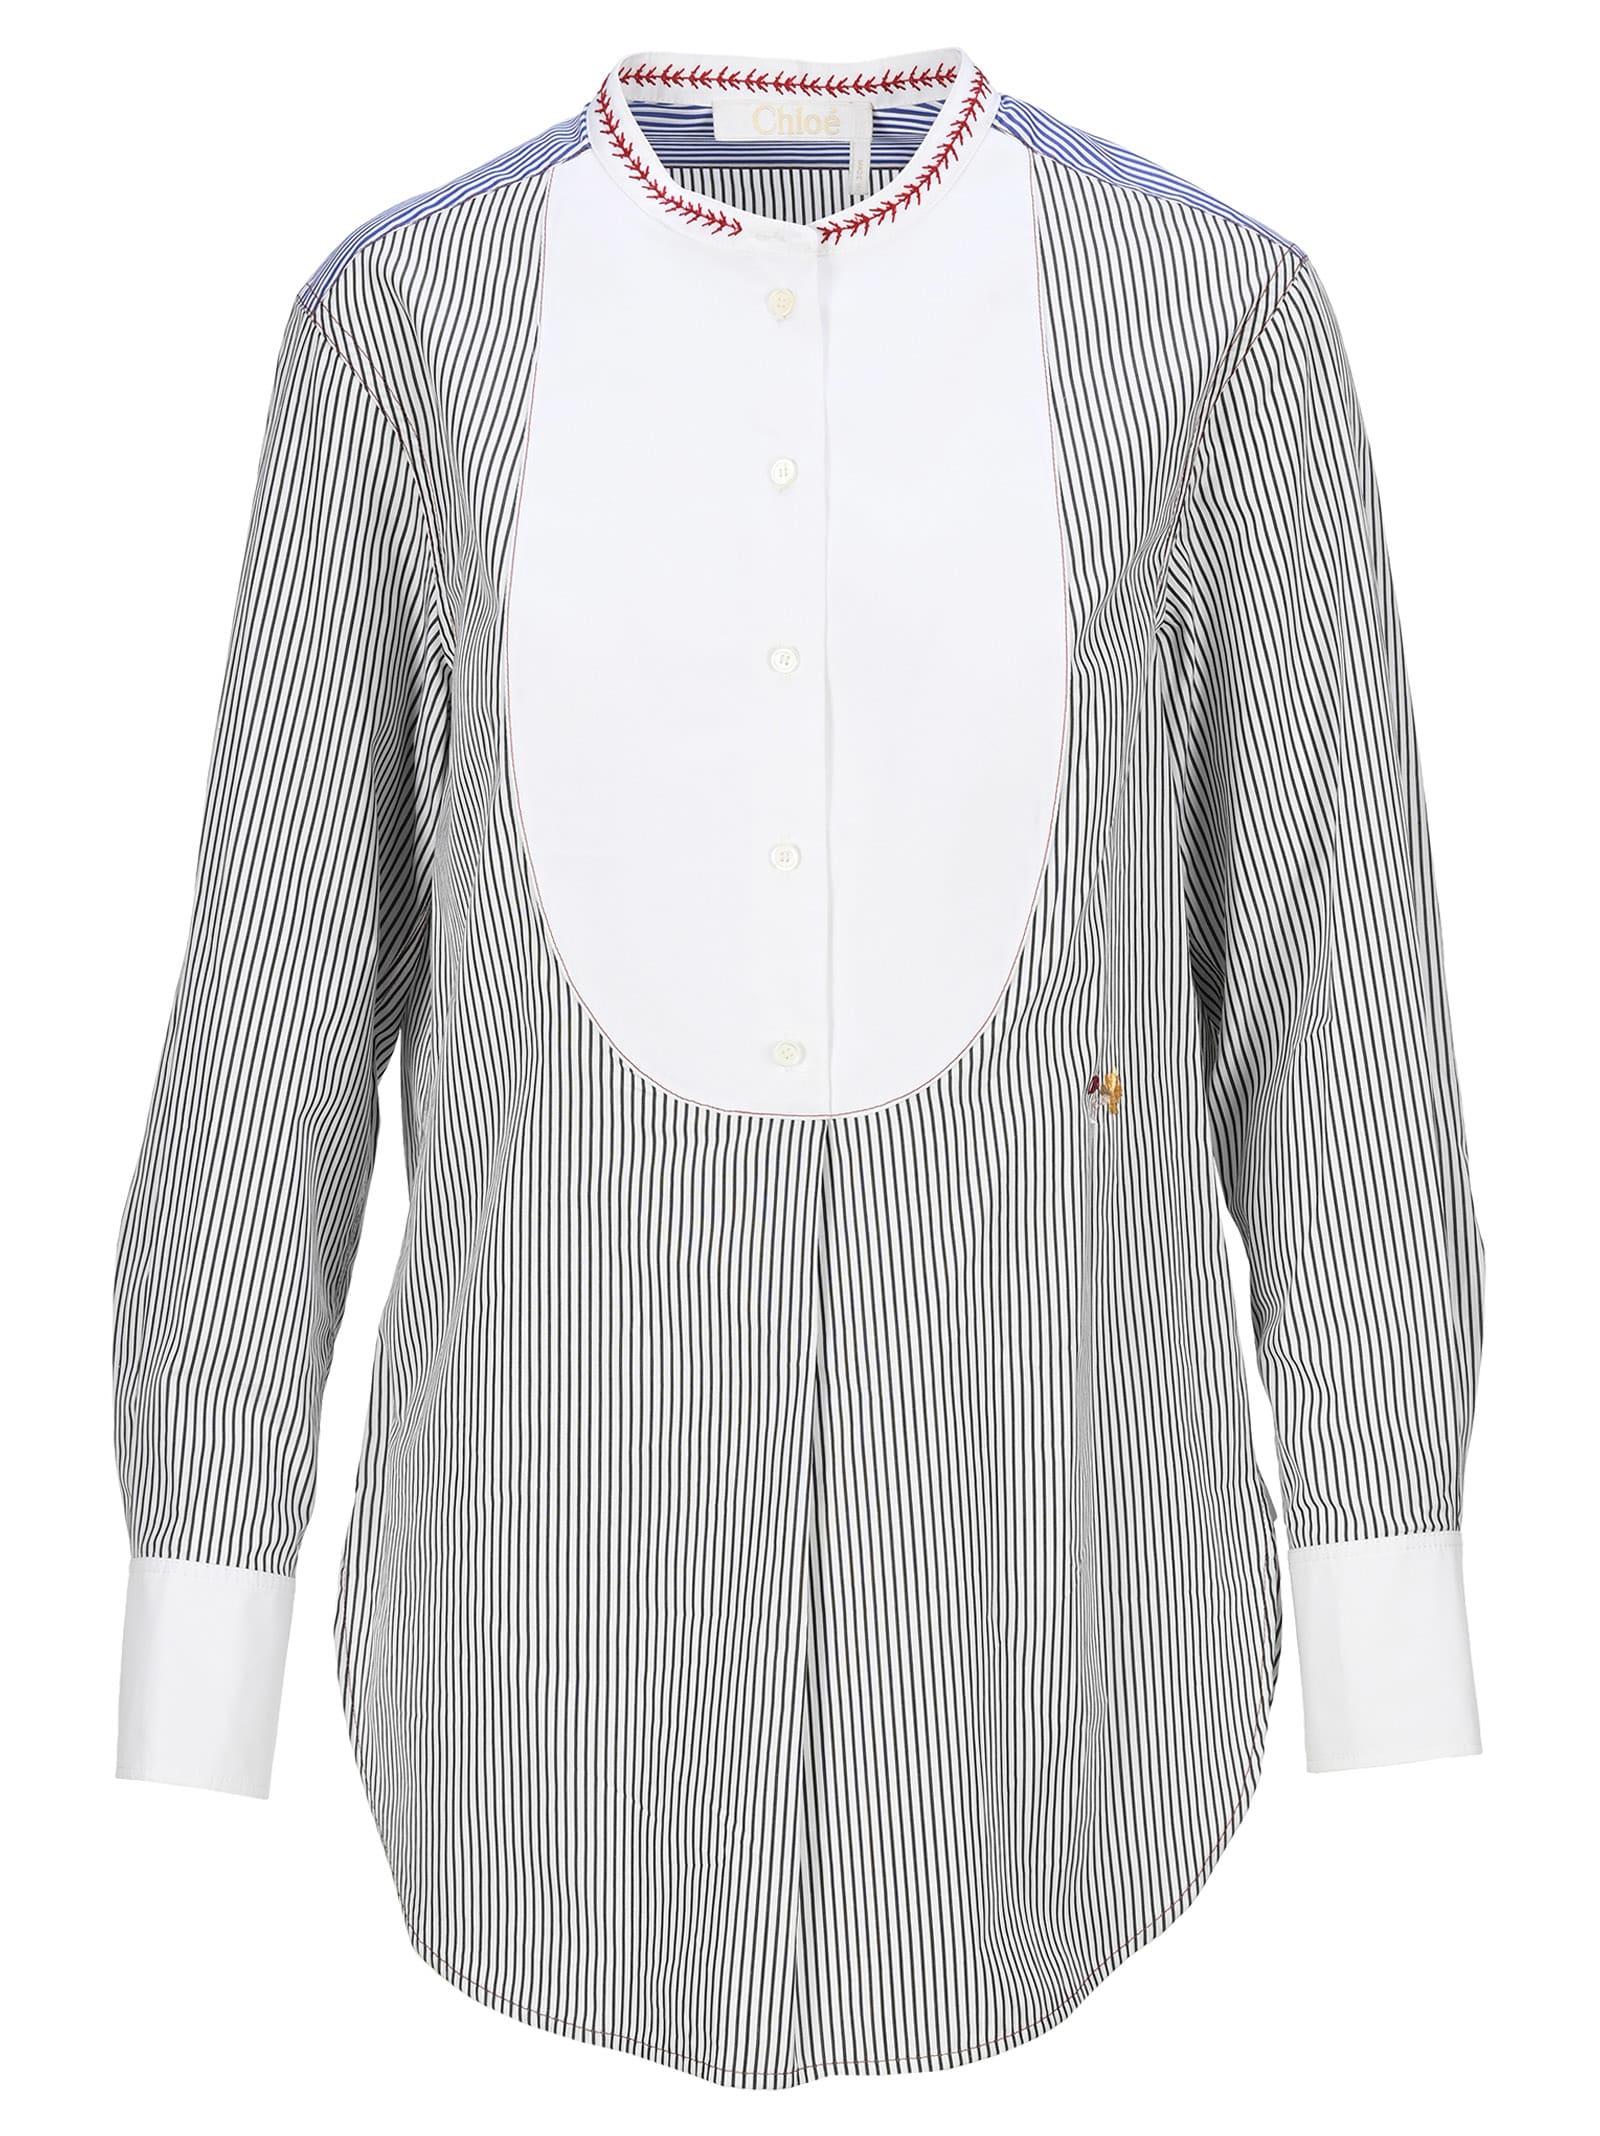 Chloé Chloe Smoking Shirt Stripes In Light Blue White